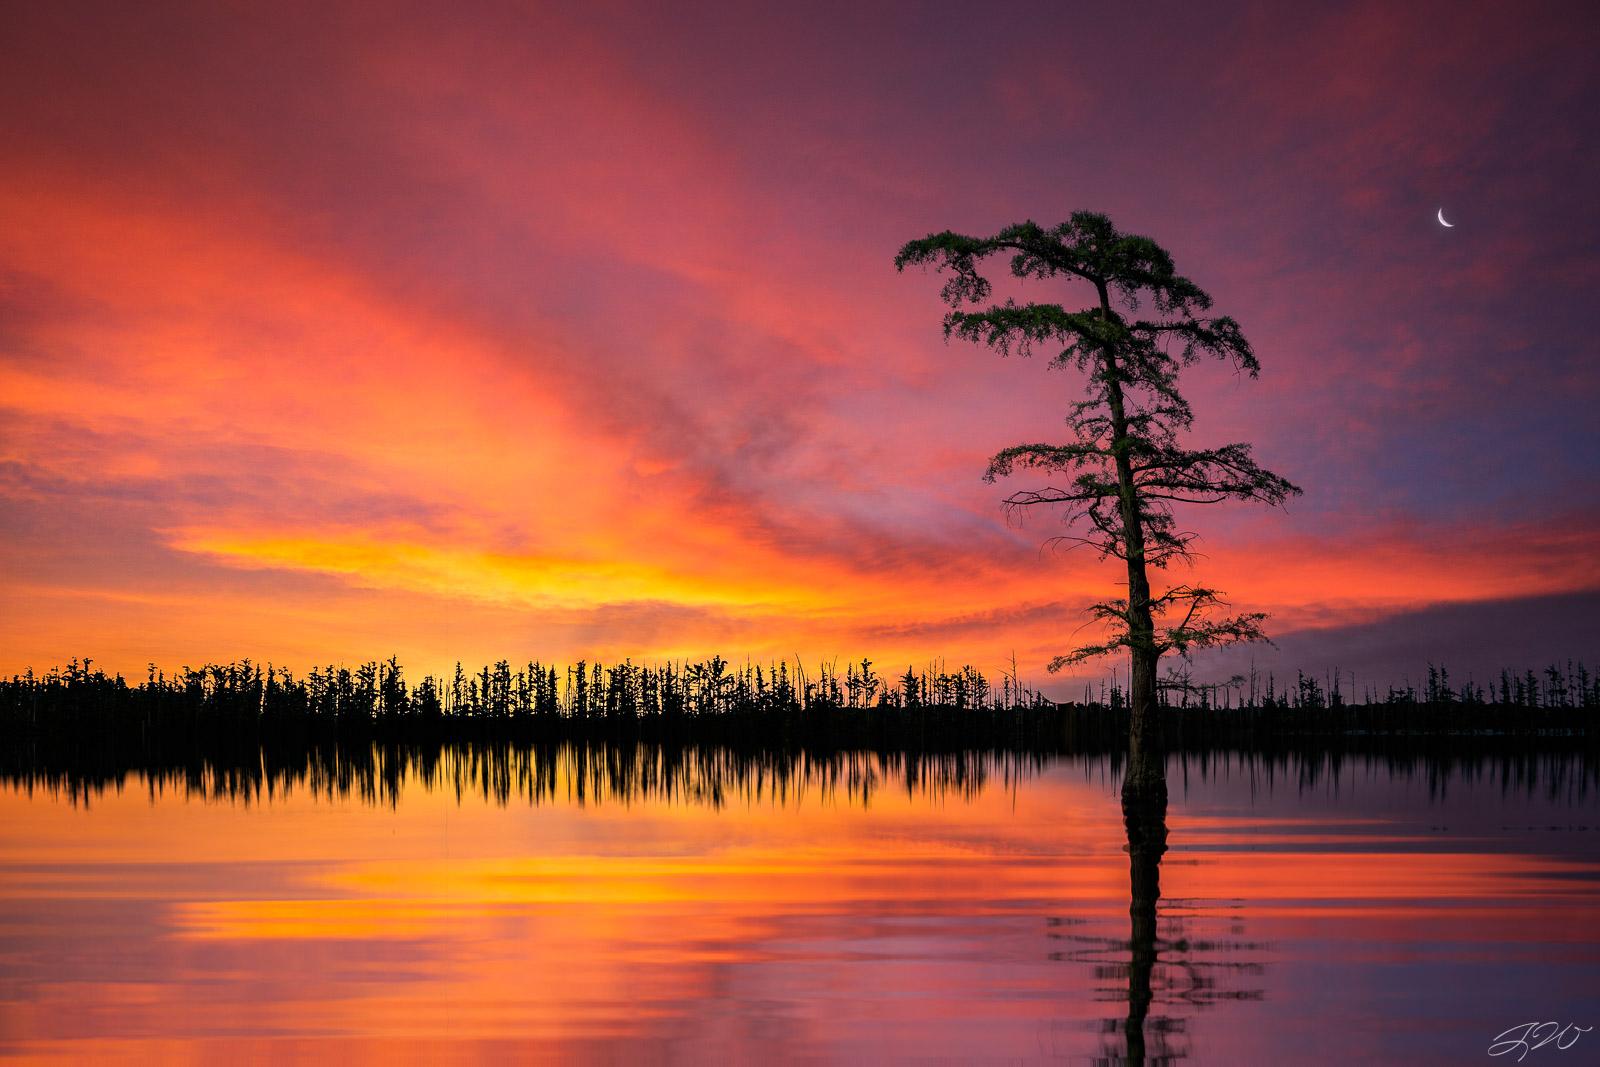 Clouds, Lake, Landscape, Moon, Reflection, Sunset, bald cypress, vibrant, photo